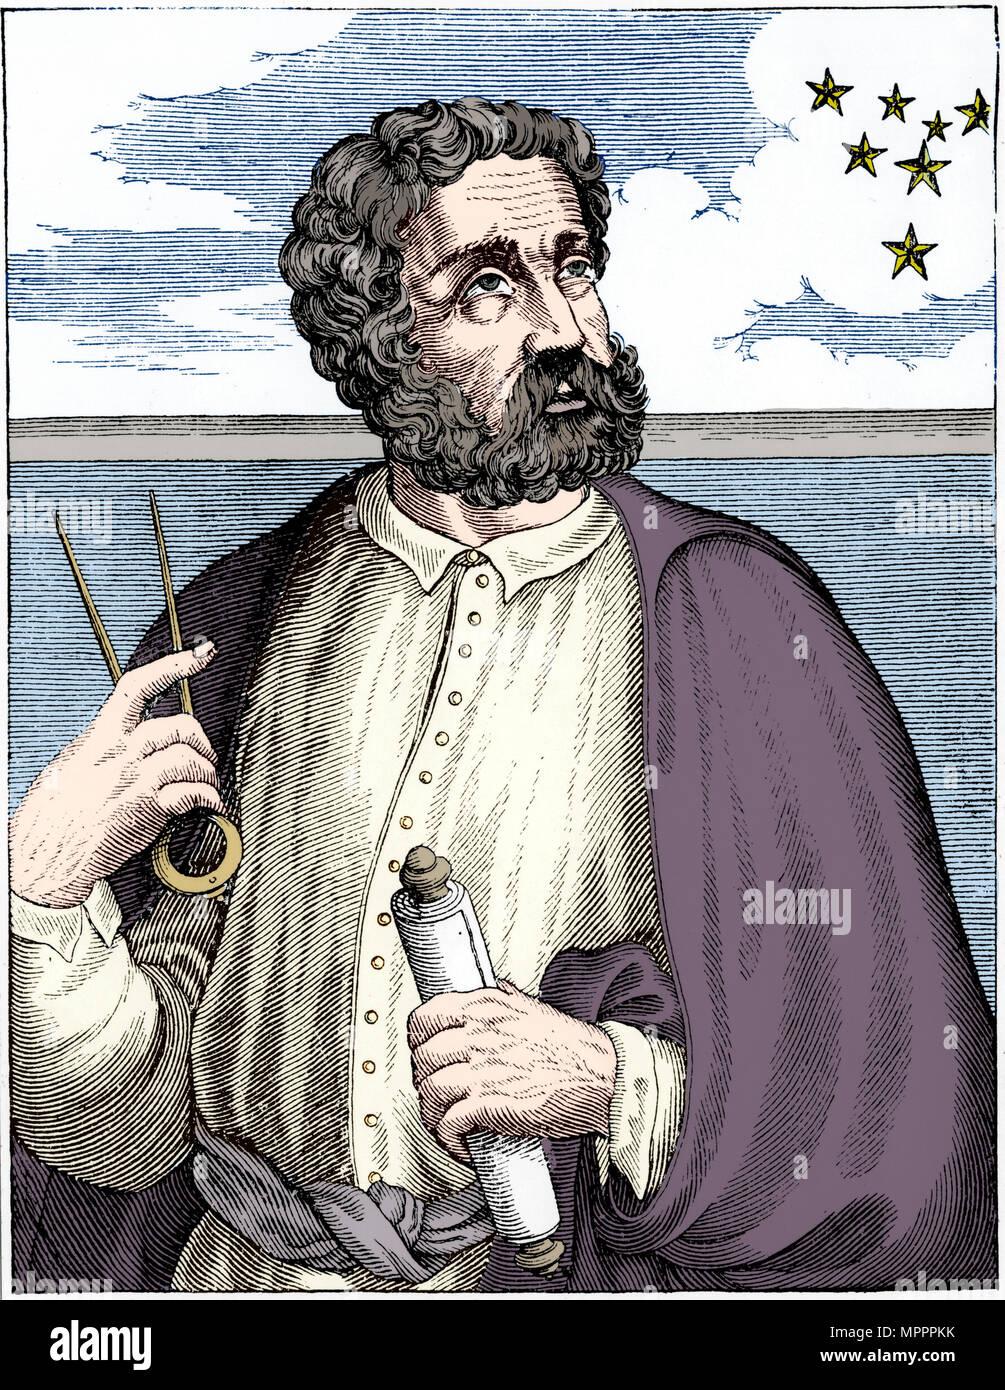 Ferdinand Magellan (c1480-c1521), Portugese navigator.  Artist: Unknown. - Stock Image